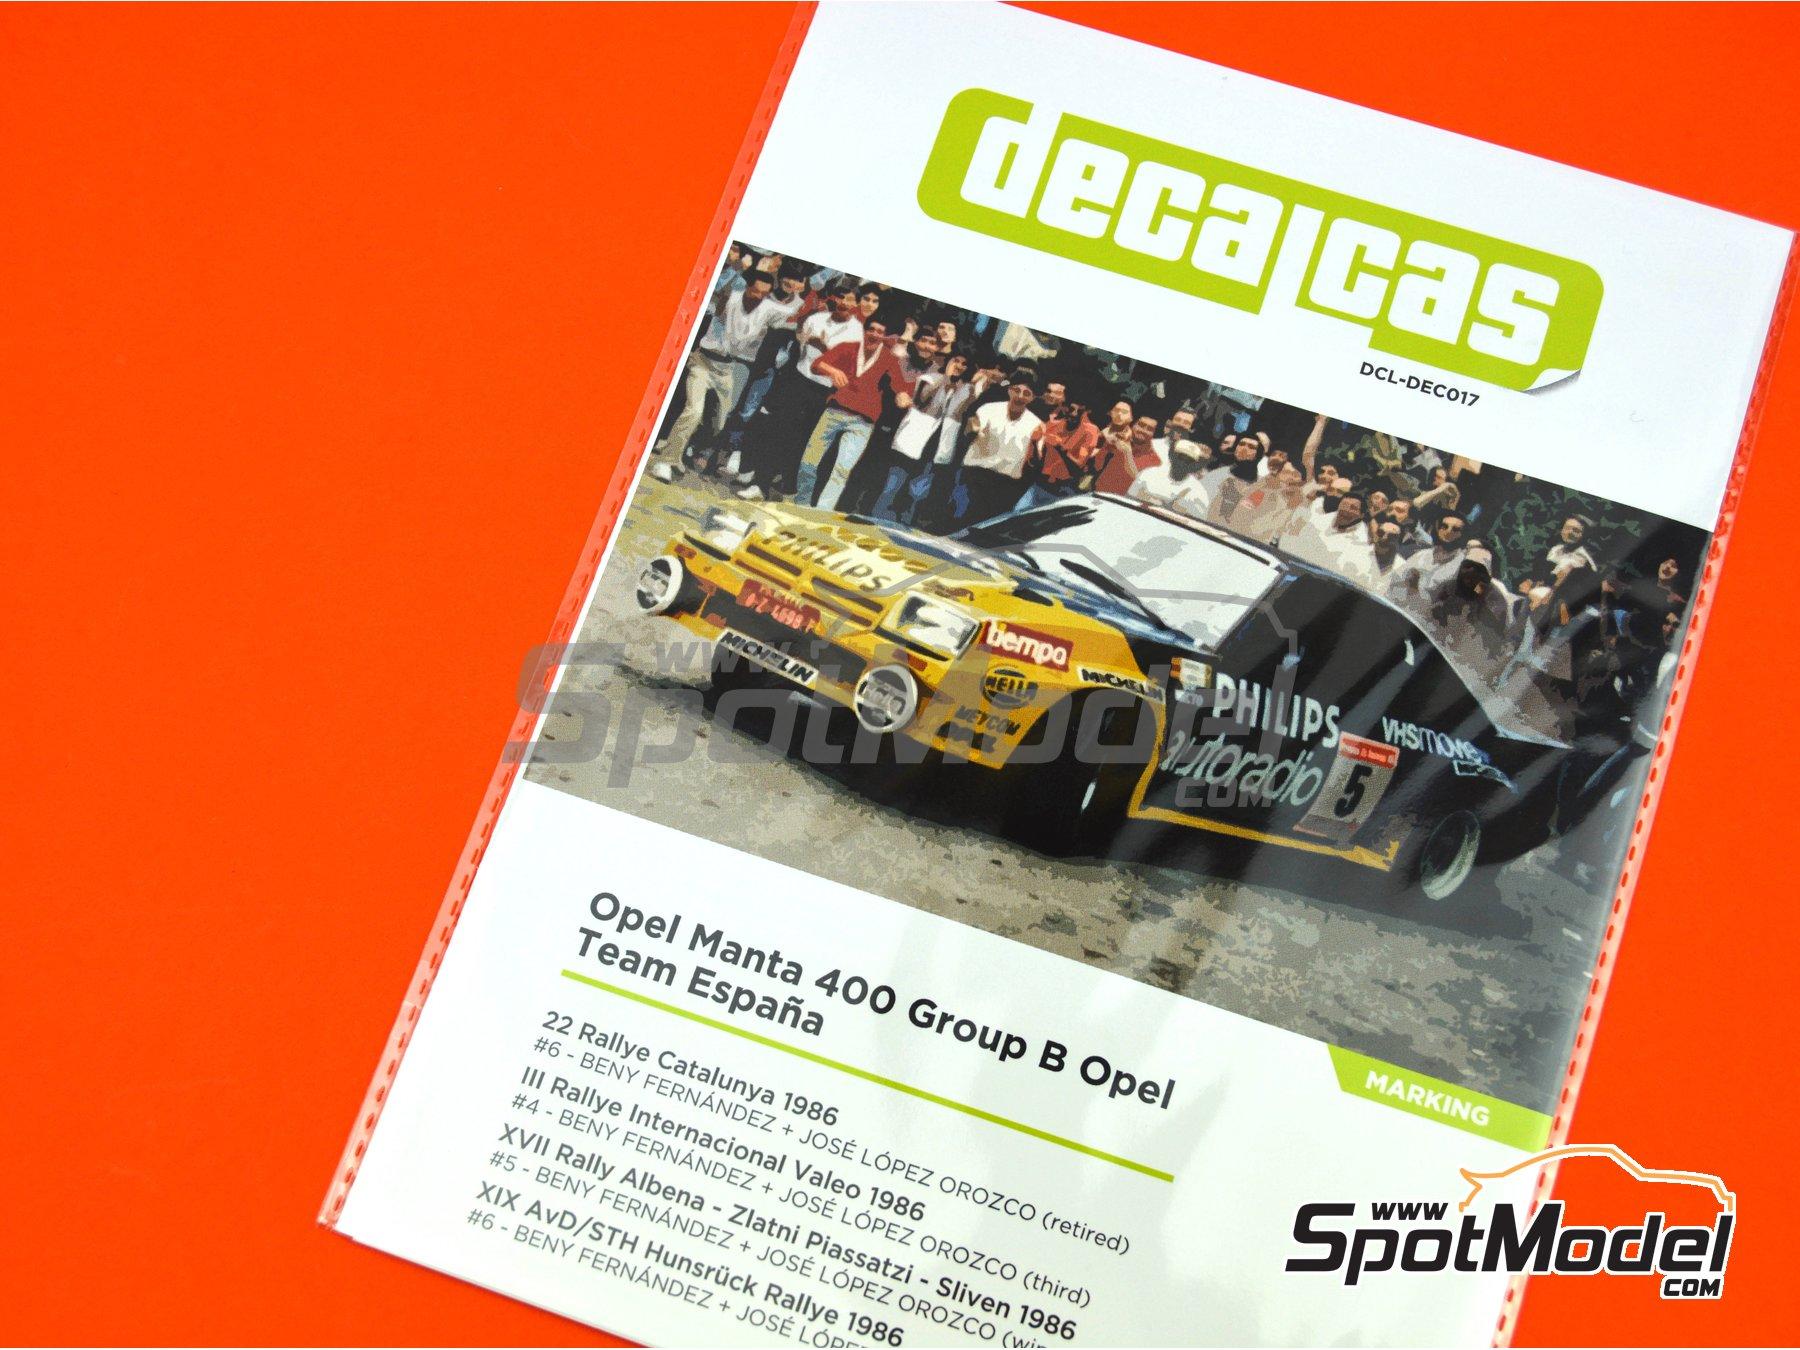 Image 11: Opel Manta 400 Group B Opel Team España - AvD/STH Hunsrück Rallye, Valeo Rally, Rallye Catalunya, Rally Albena - Zlatni Piassatzi - Sliven 1986 | Marking / livery in 1/24 scale manufactured by Decalcas (ref.DCL-DEC017)